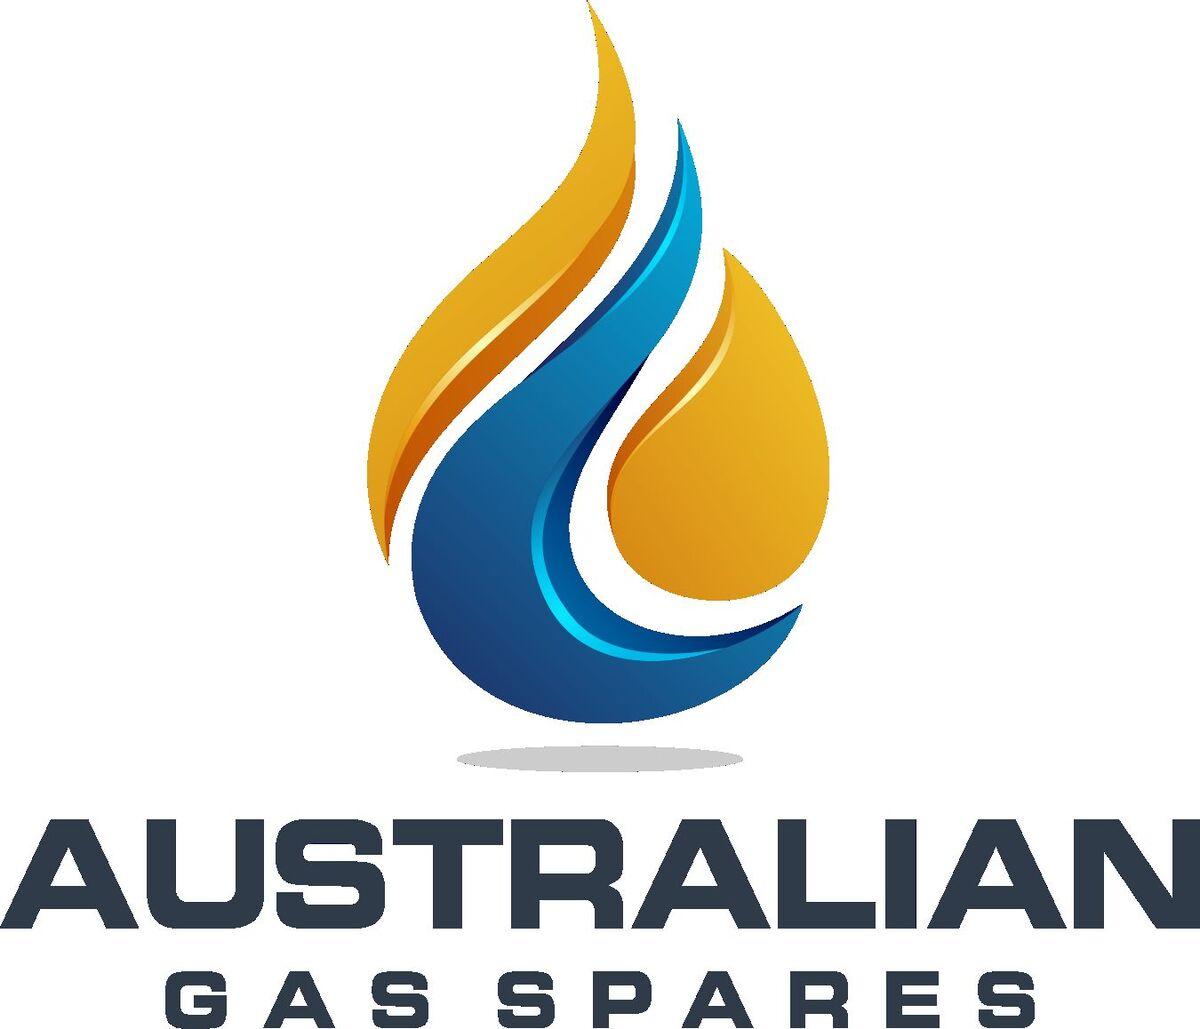 Australian Gas Spares